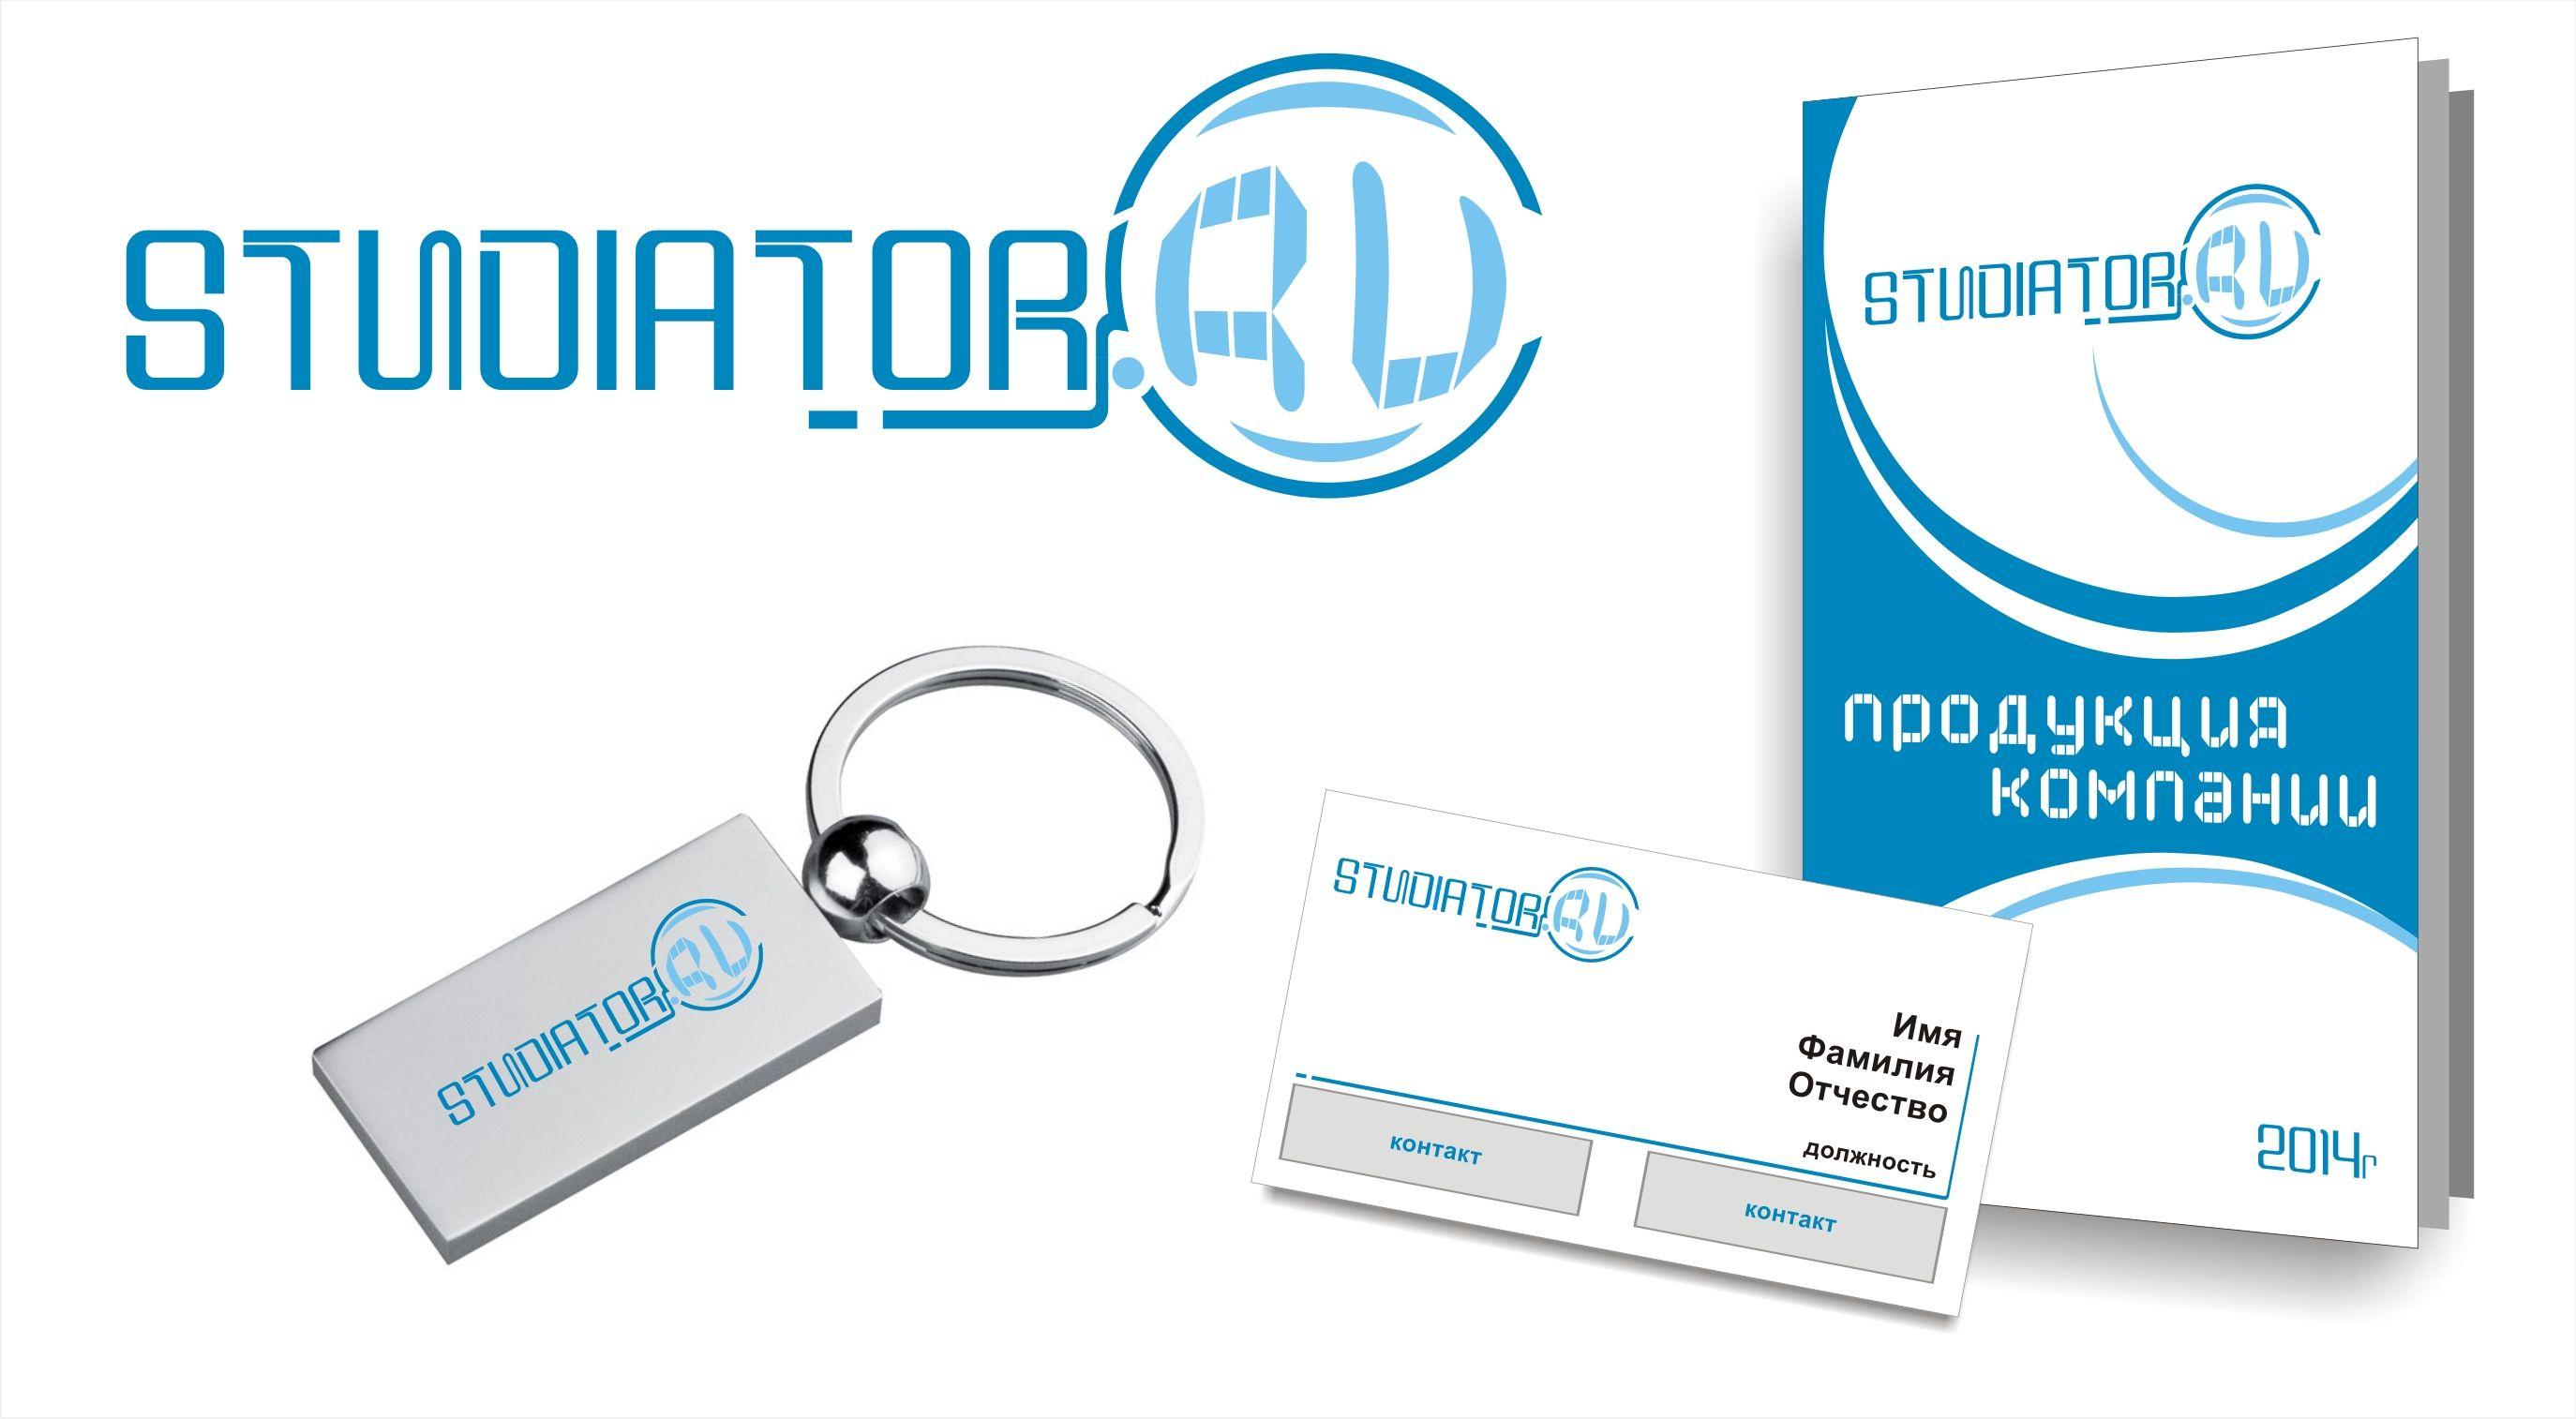 Логотип для каталога студий Веб-дизайна - дизайнер LiXoOnshade